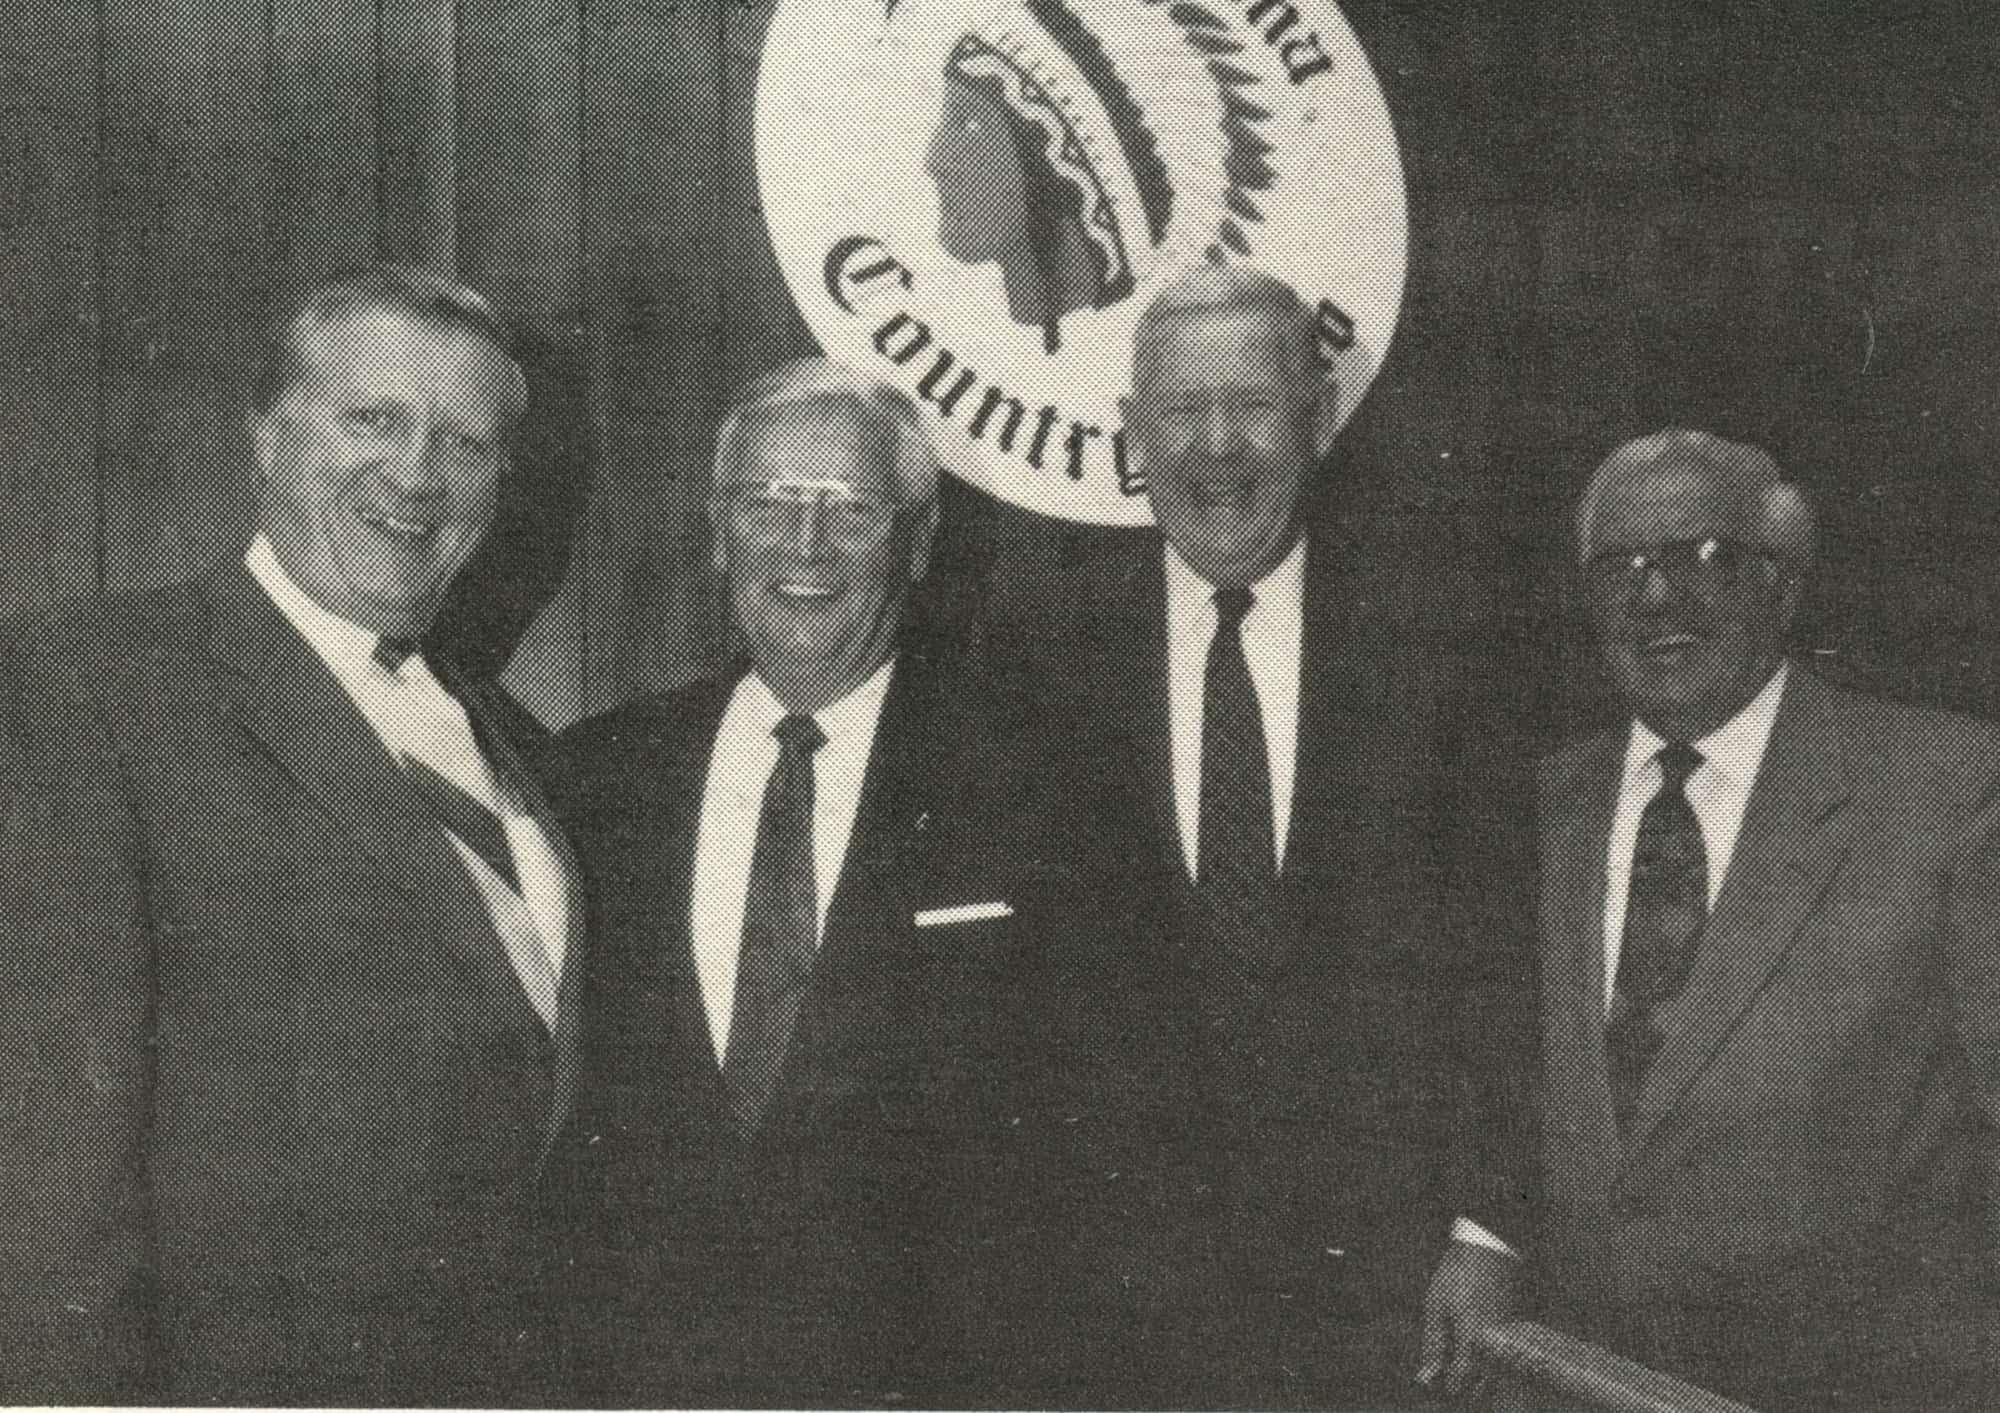 George Steinbrenner-Mayor Pfuhl-Congressman Murtha-Oldtimers Pres George Arcurio Jr at AAABA HOF banquet